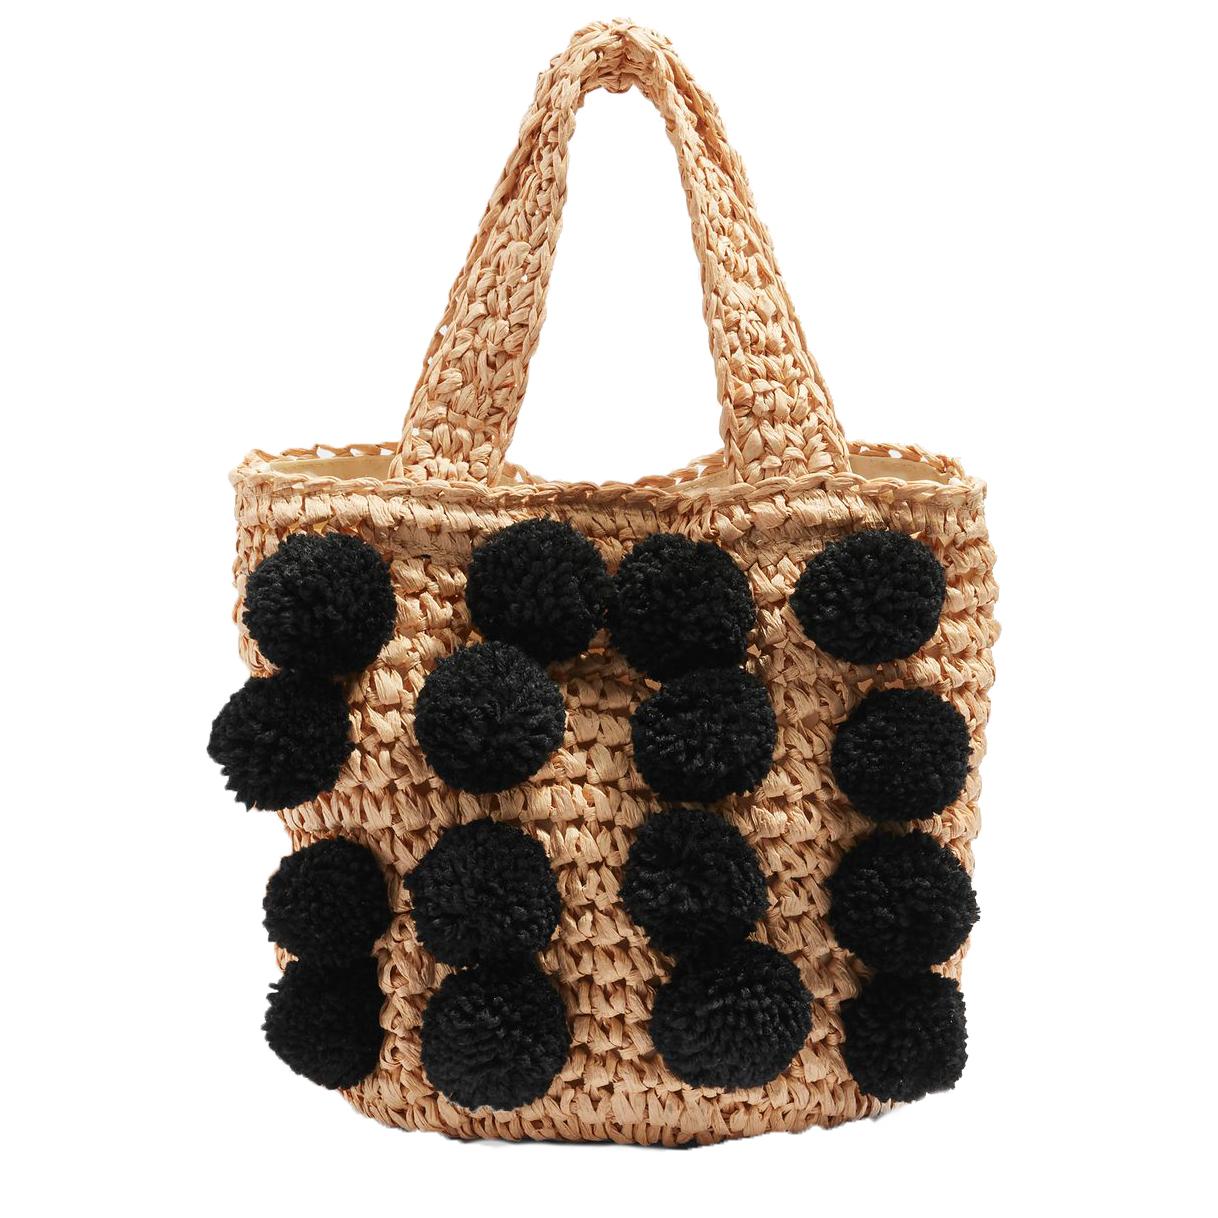 Topshop Pom Pom Straw Tote Bag